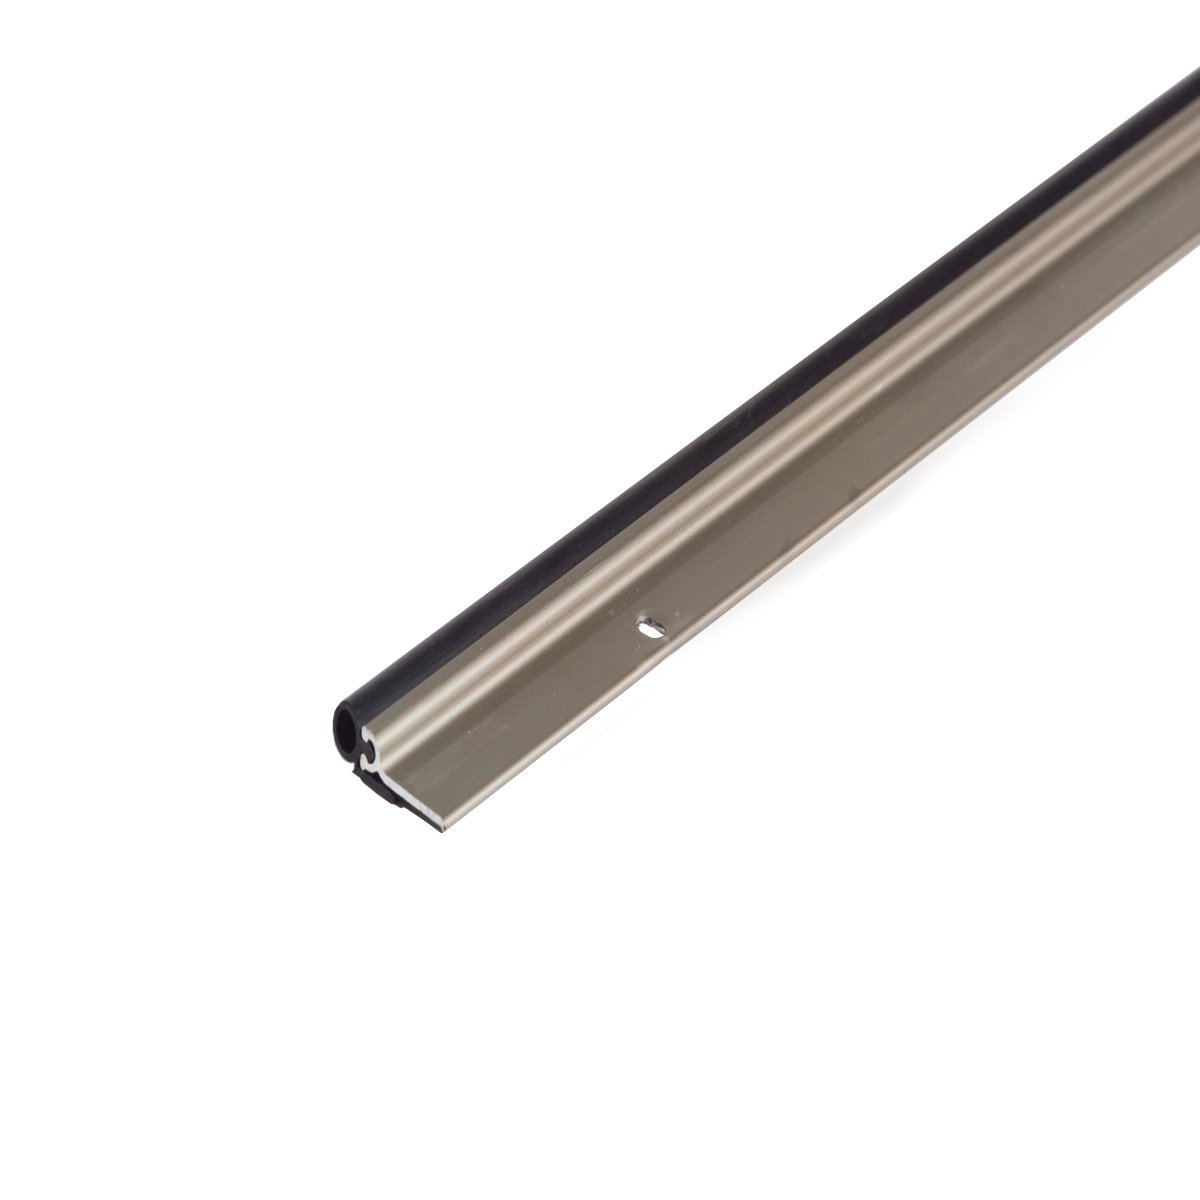 M-D Building Products 25730 Flat Profile Door Jamb Weatherstrip Kit